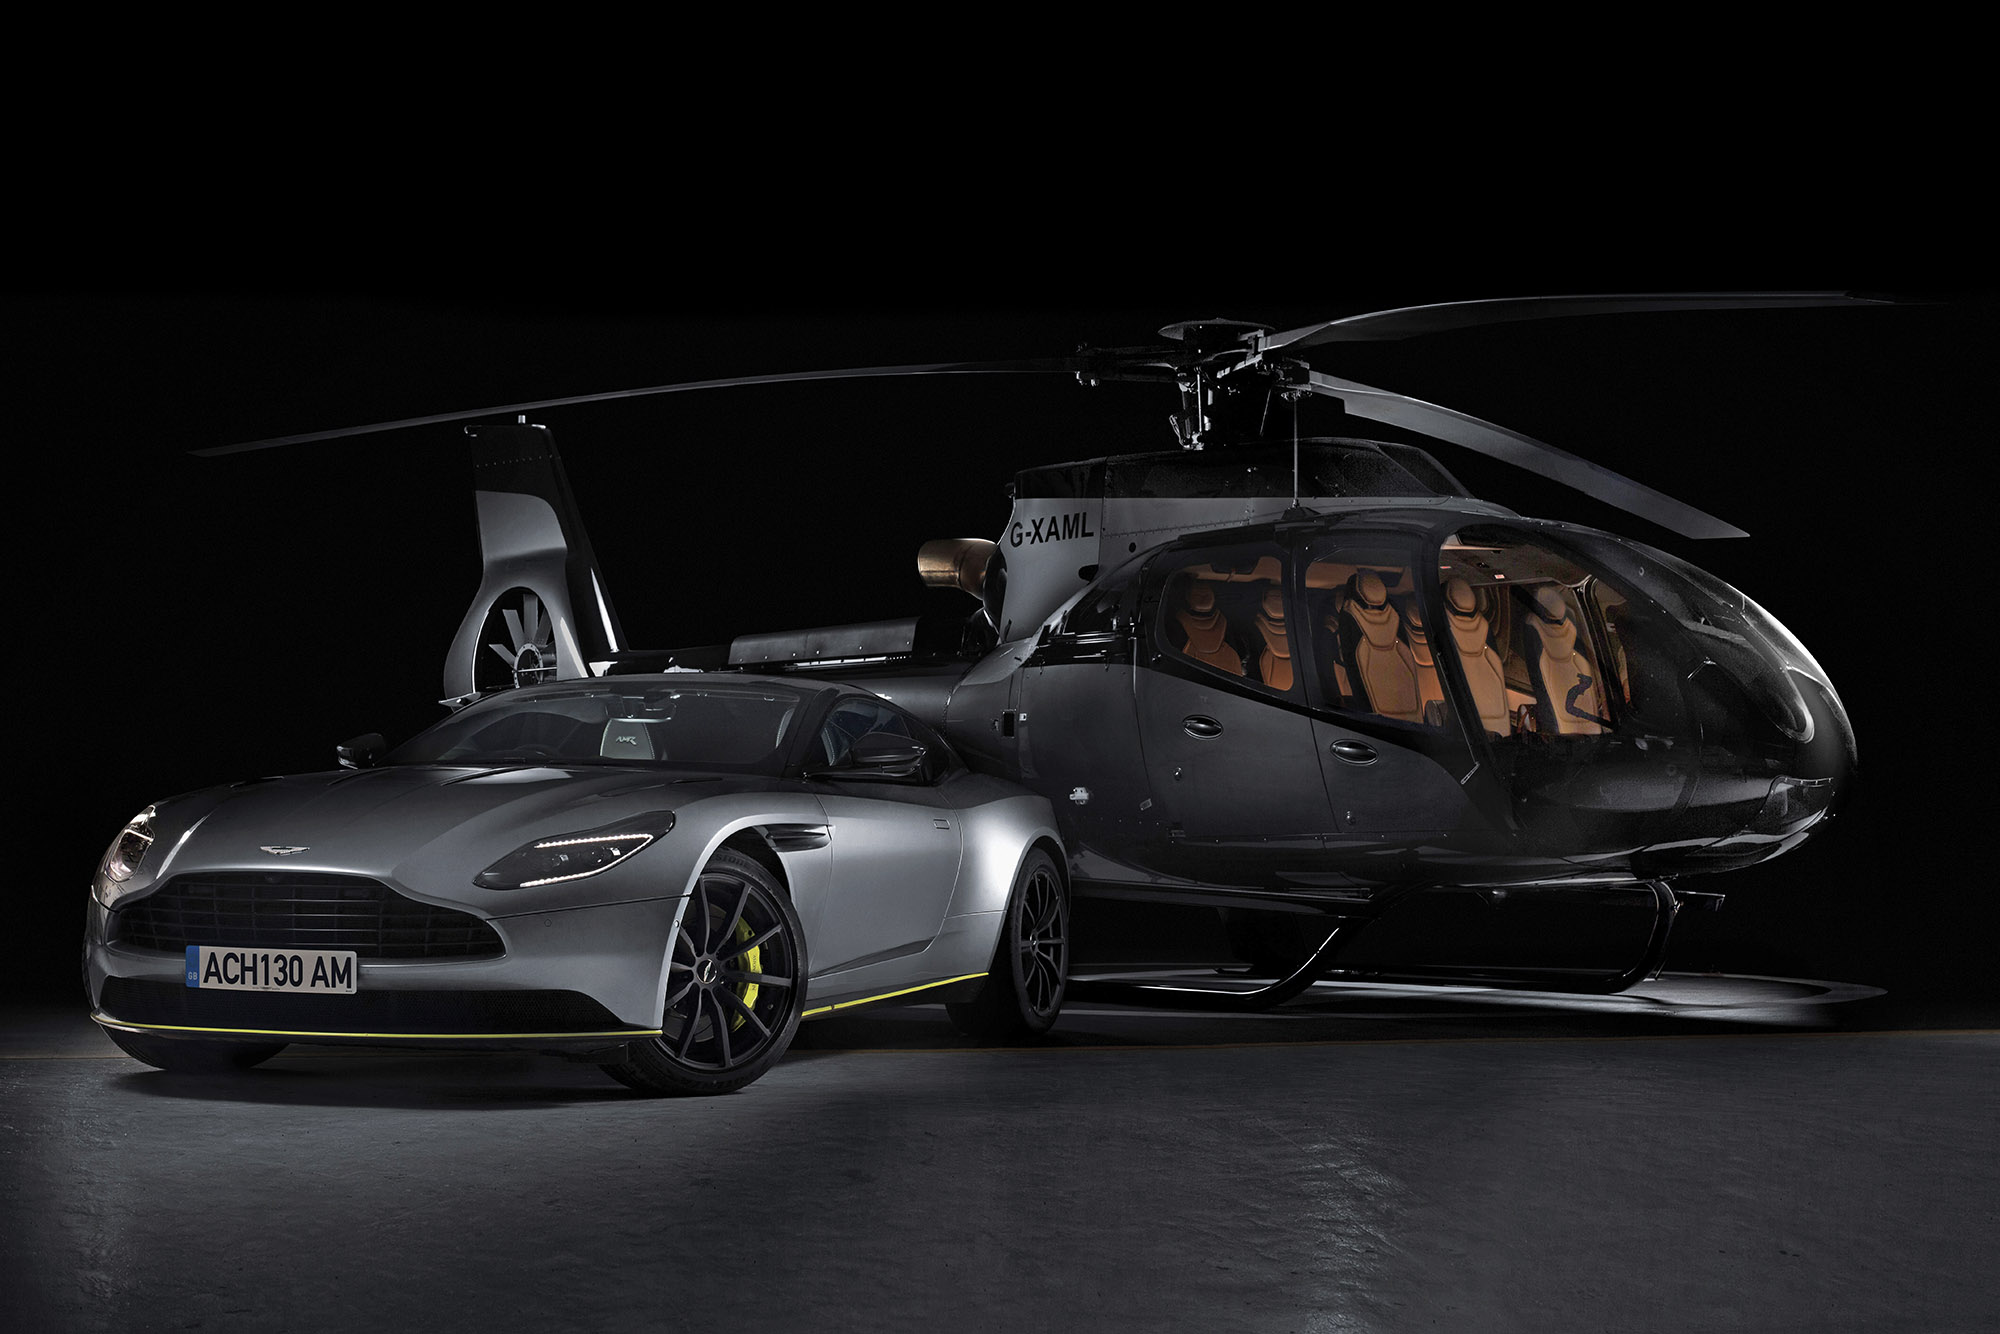 Aston Martin Helicopter